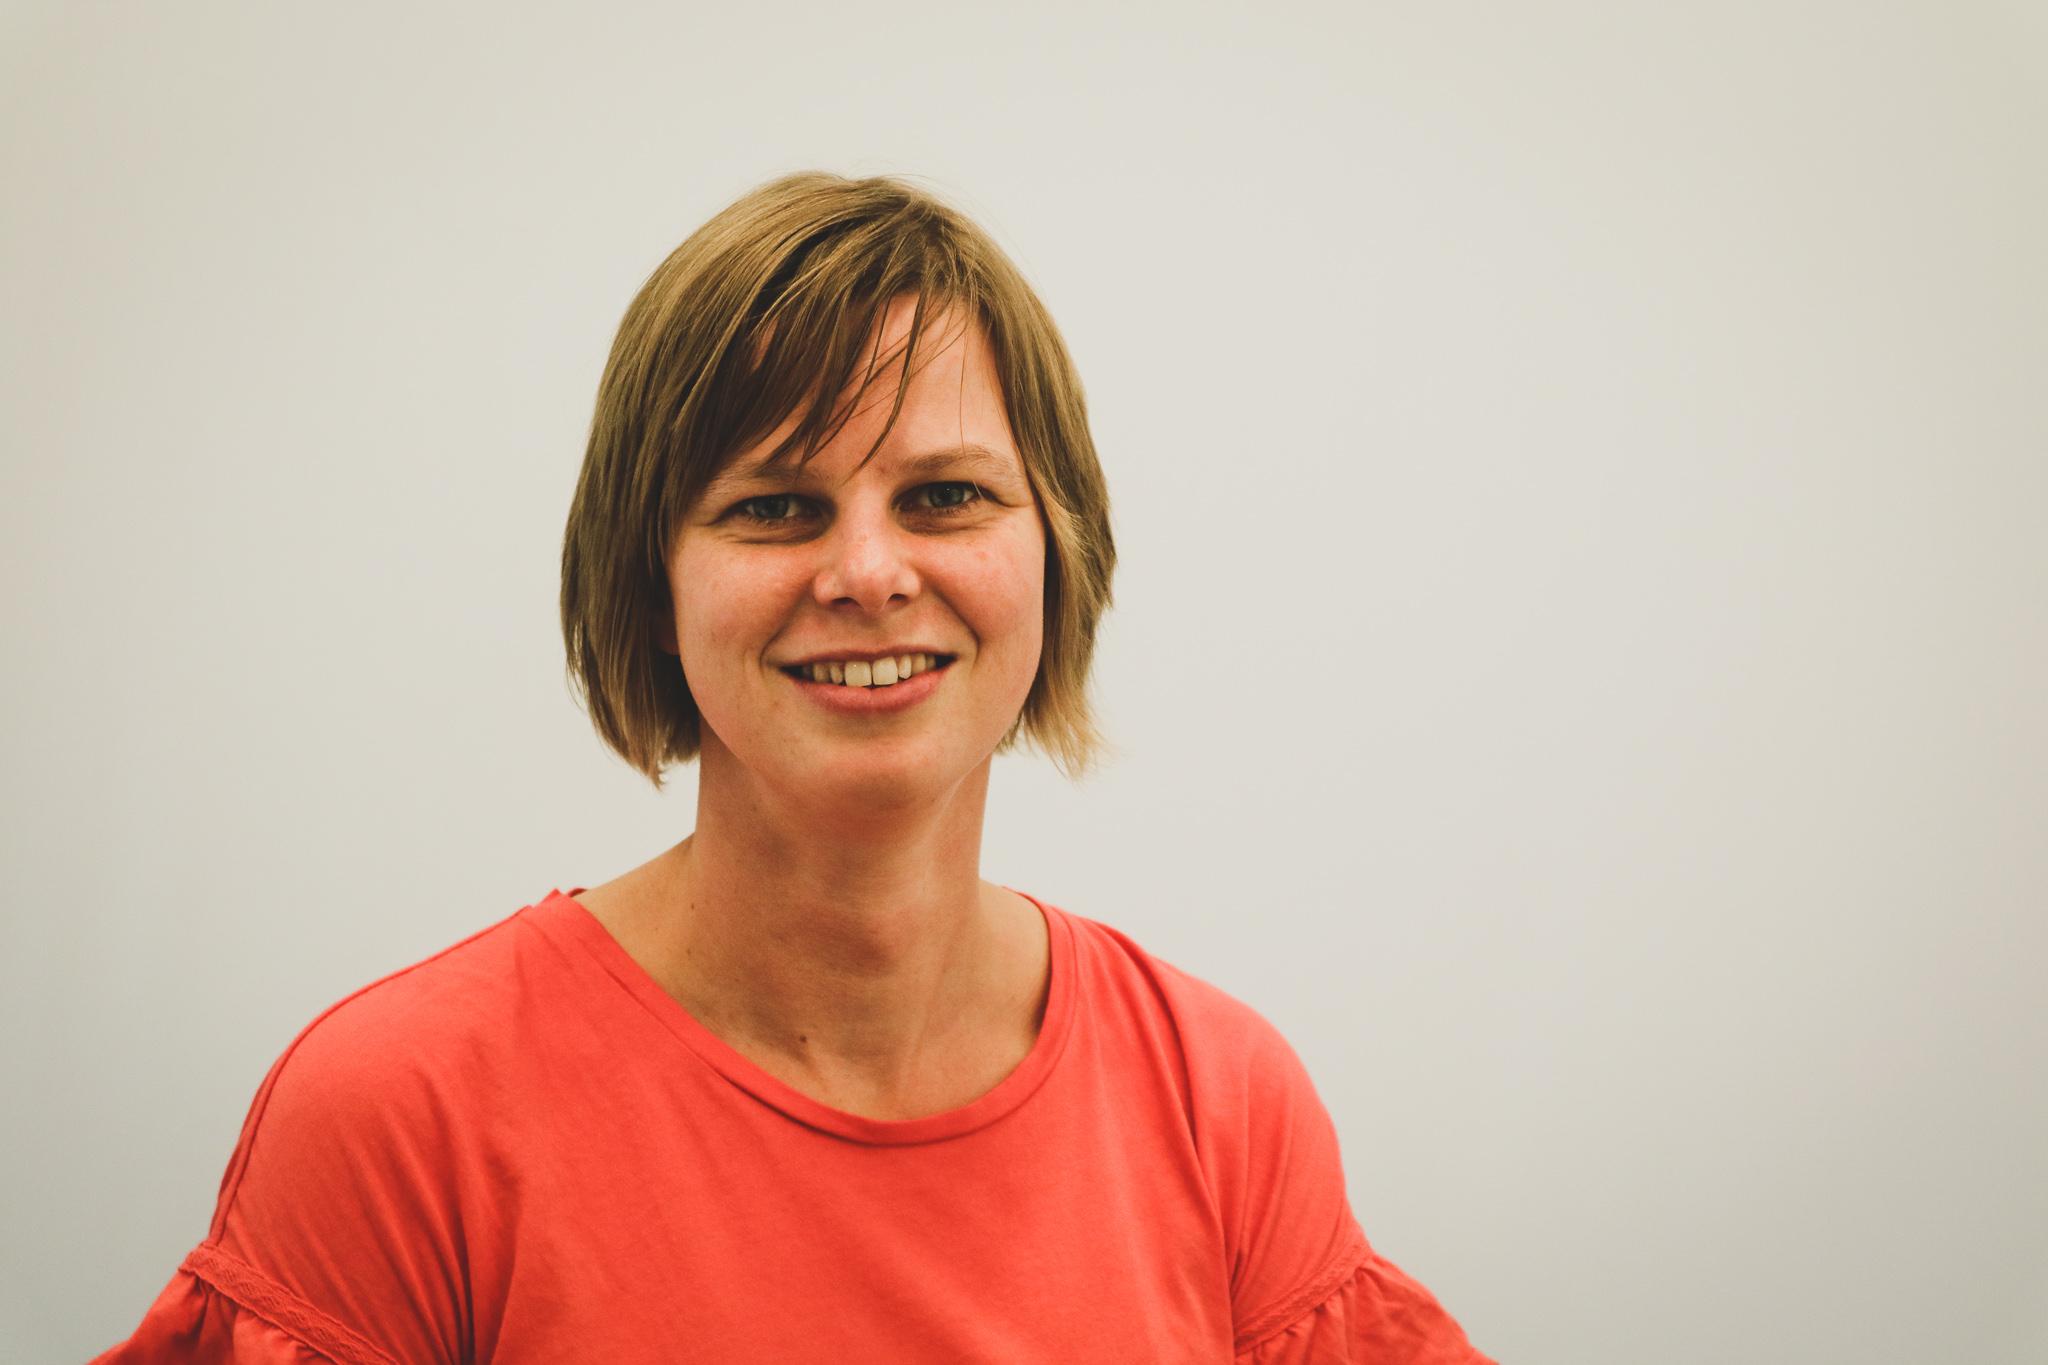 Anneleen Van Tendeloo